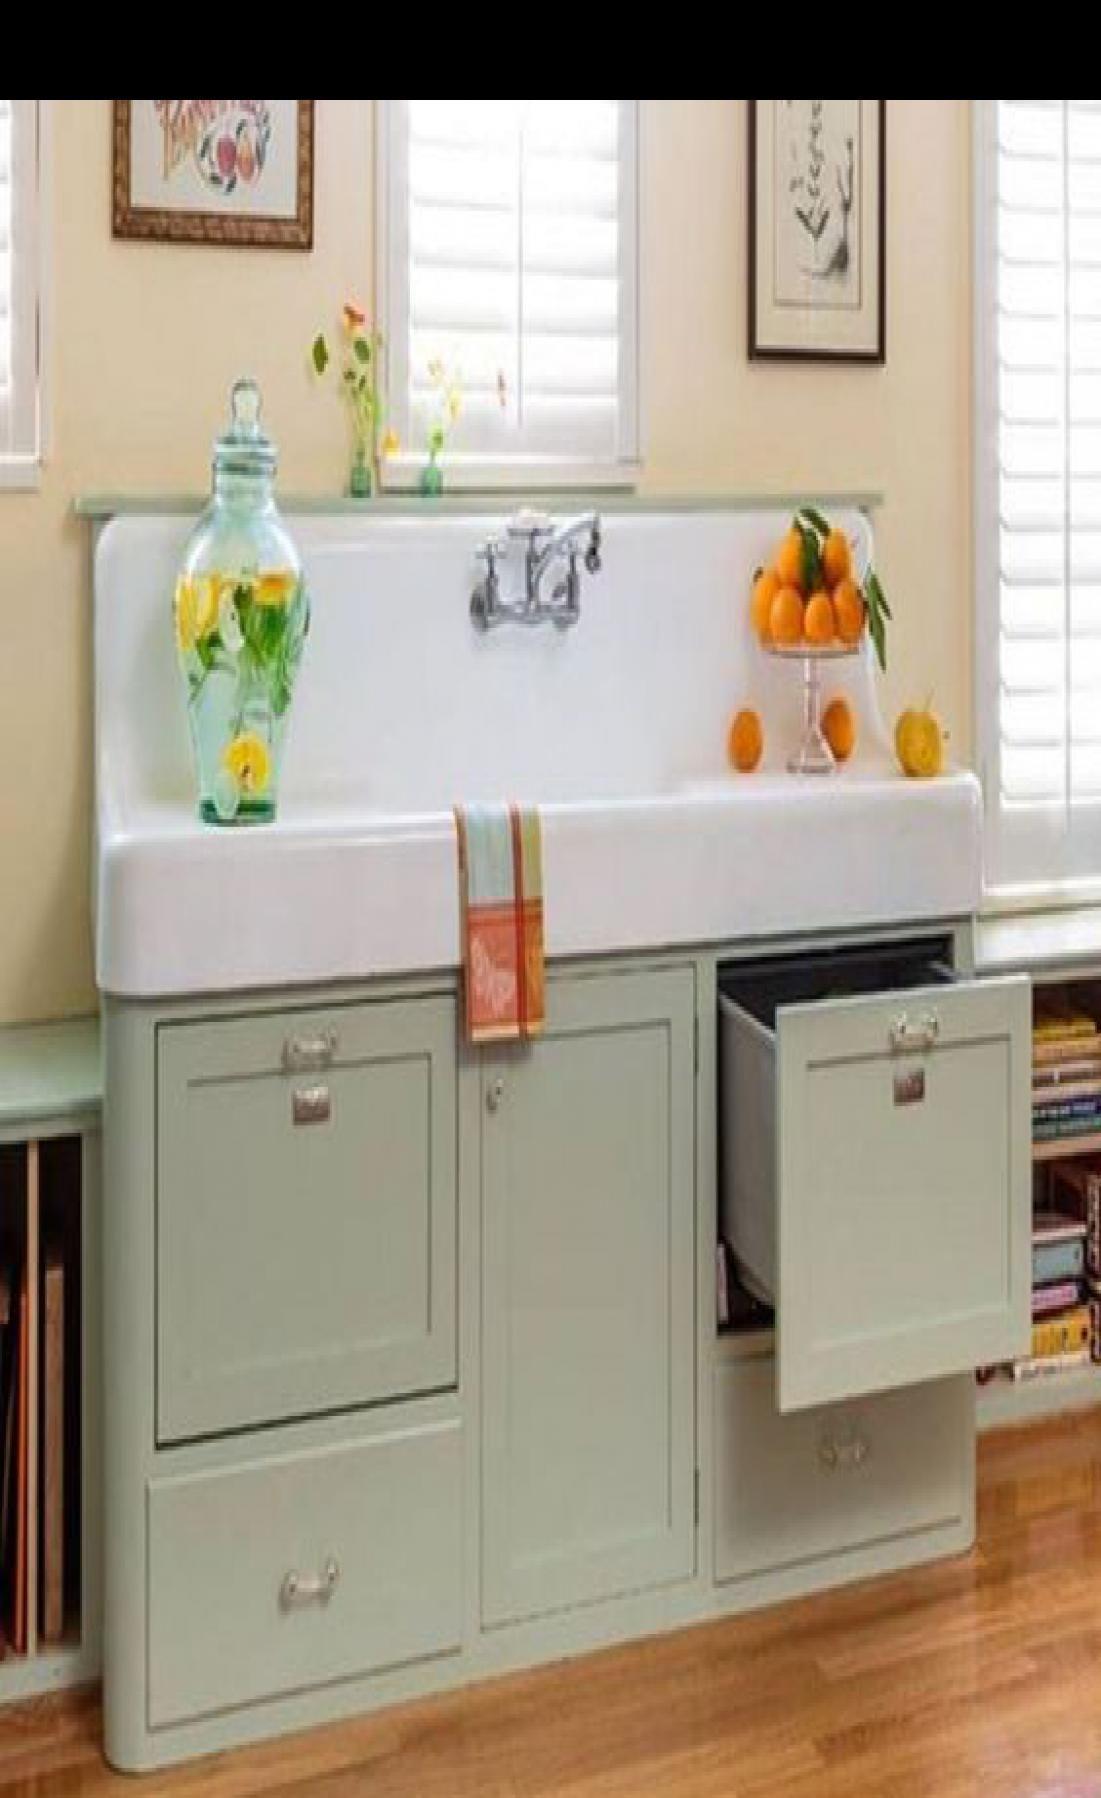 49 Gorgeous Farmhouse Gray Kitchen Cabinet Design Ideas In 2020 Vintage Kitchen Cabinets Vintage Sink Vintage Kitchen Sink